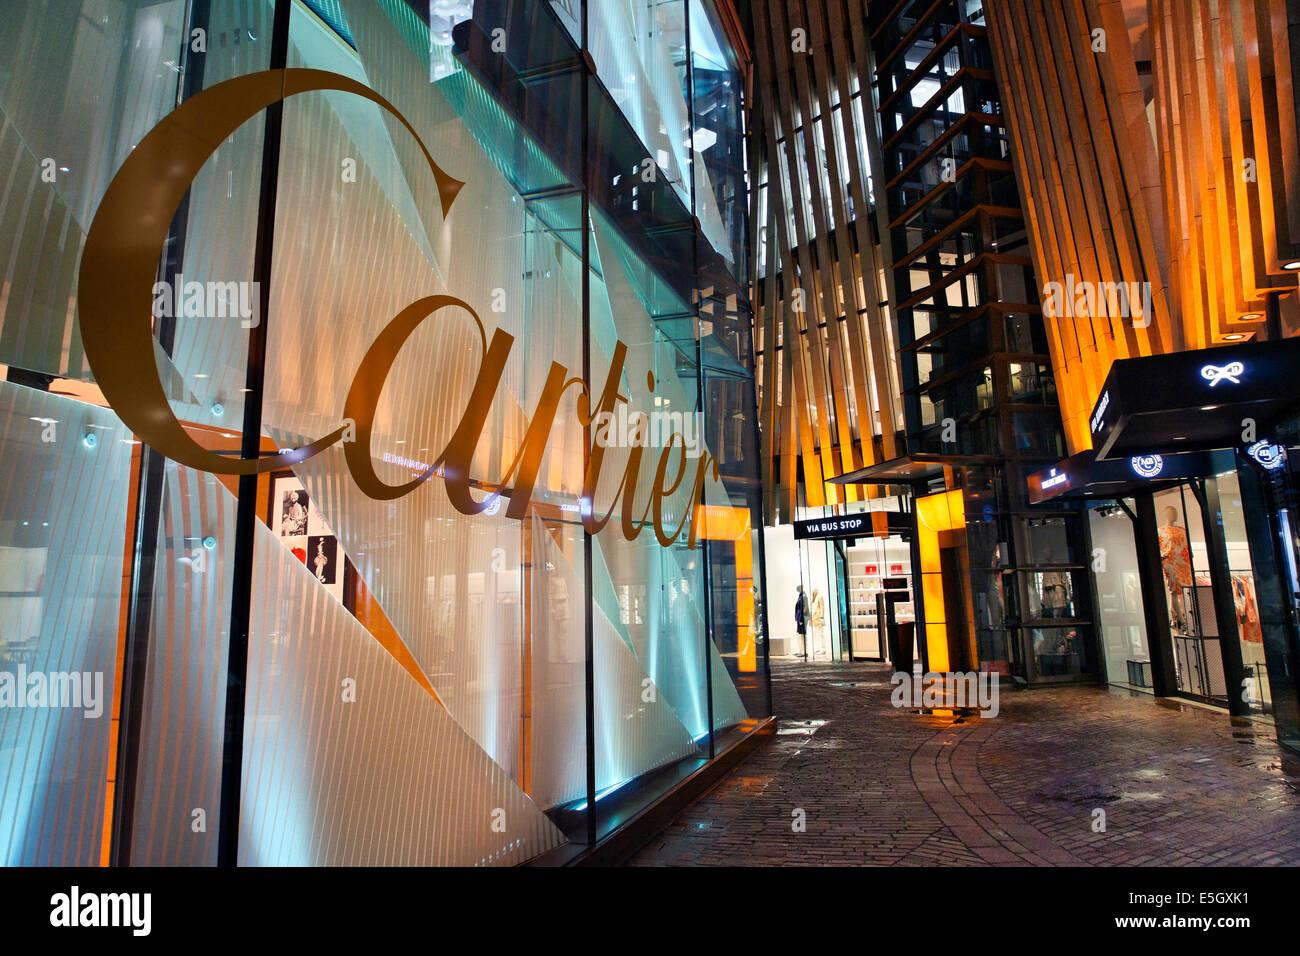 Luxury shops in Omotesando district, Tokyo, Japan. - Stock Image